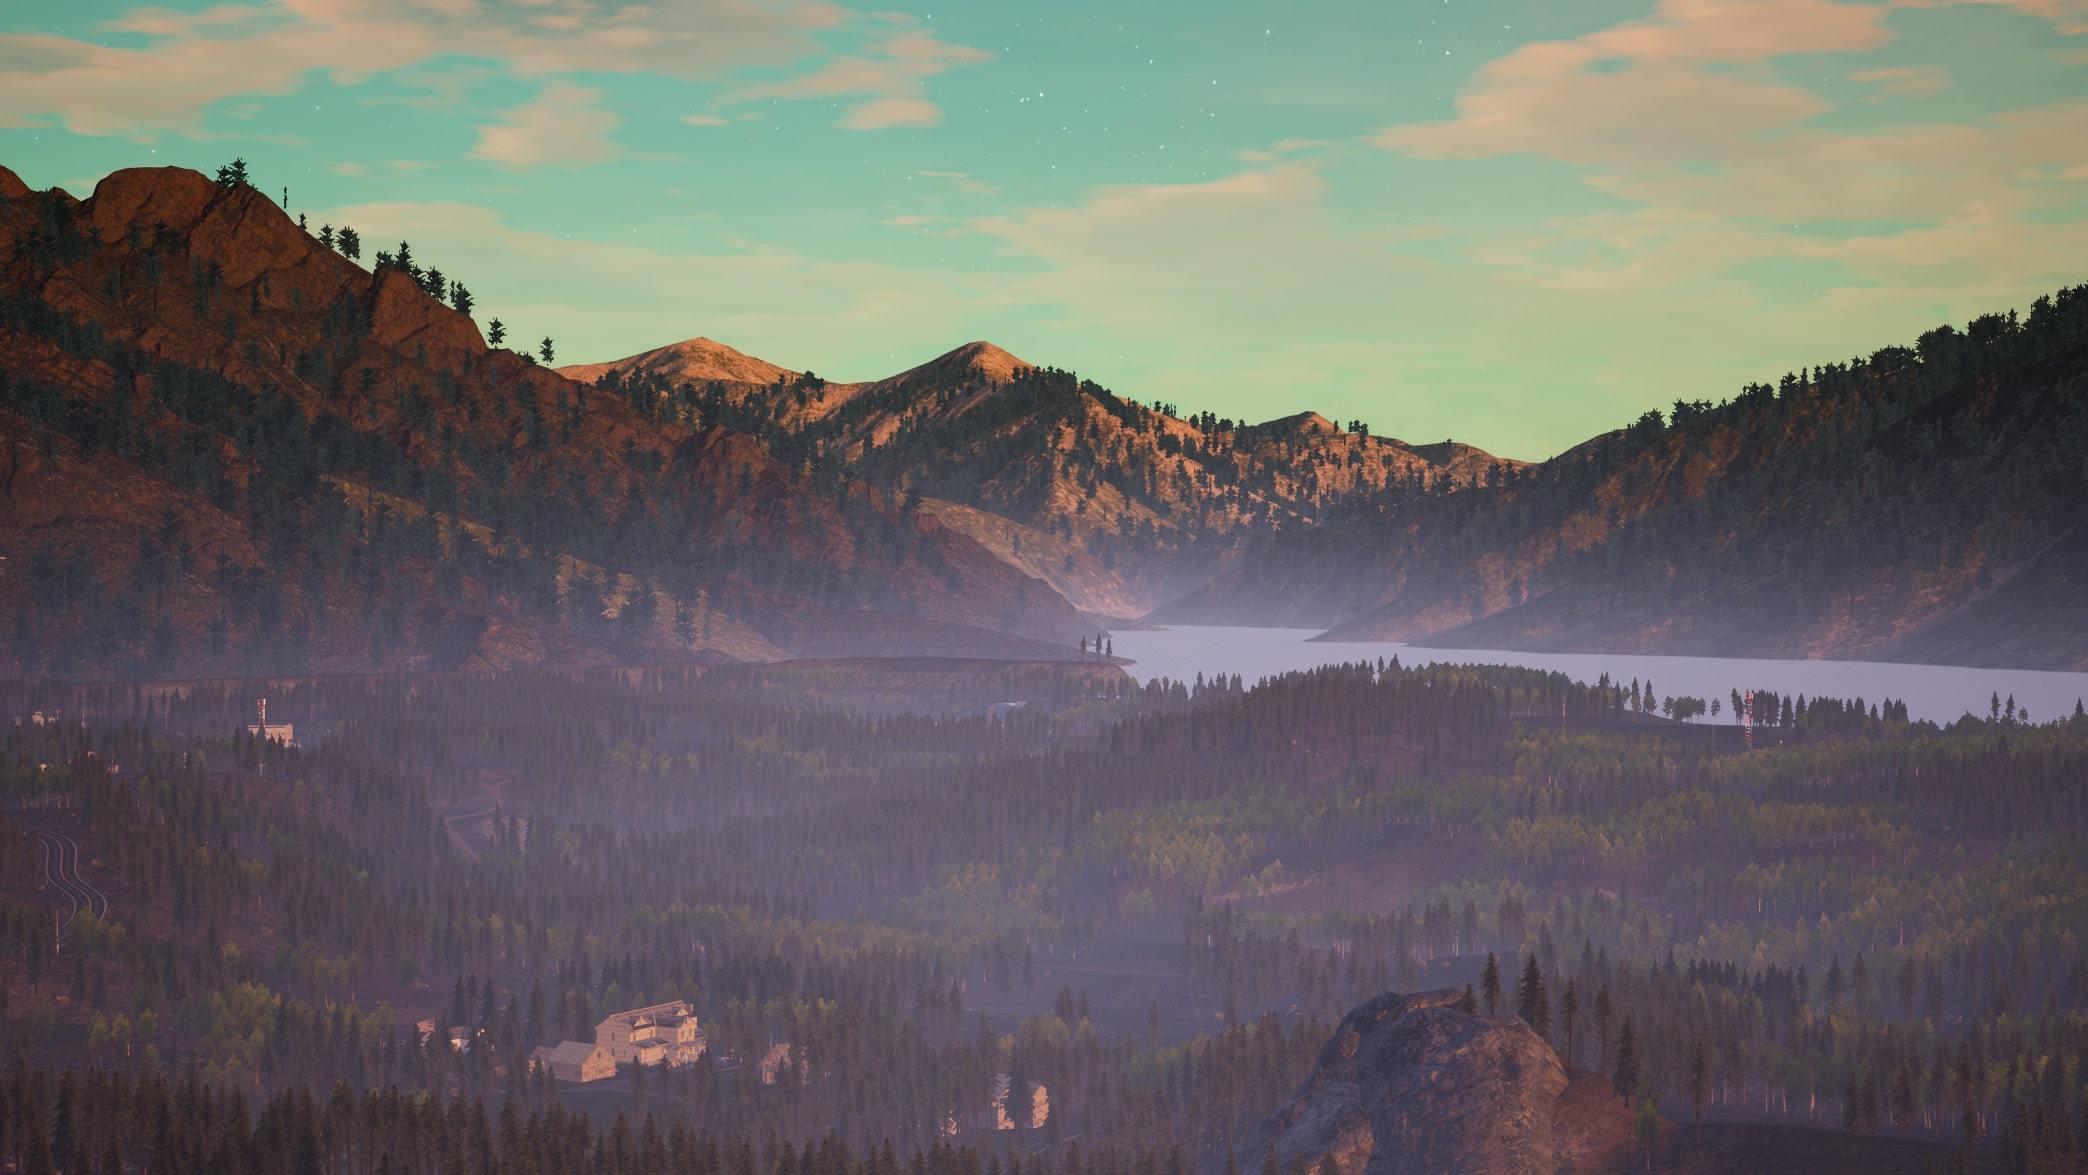 Ranch Simulator – Launching Early 2021 (PC Early Access) news - Mod DB